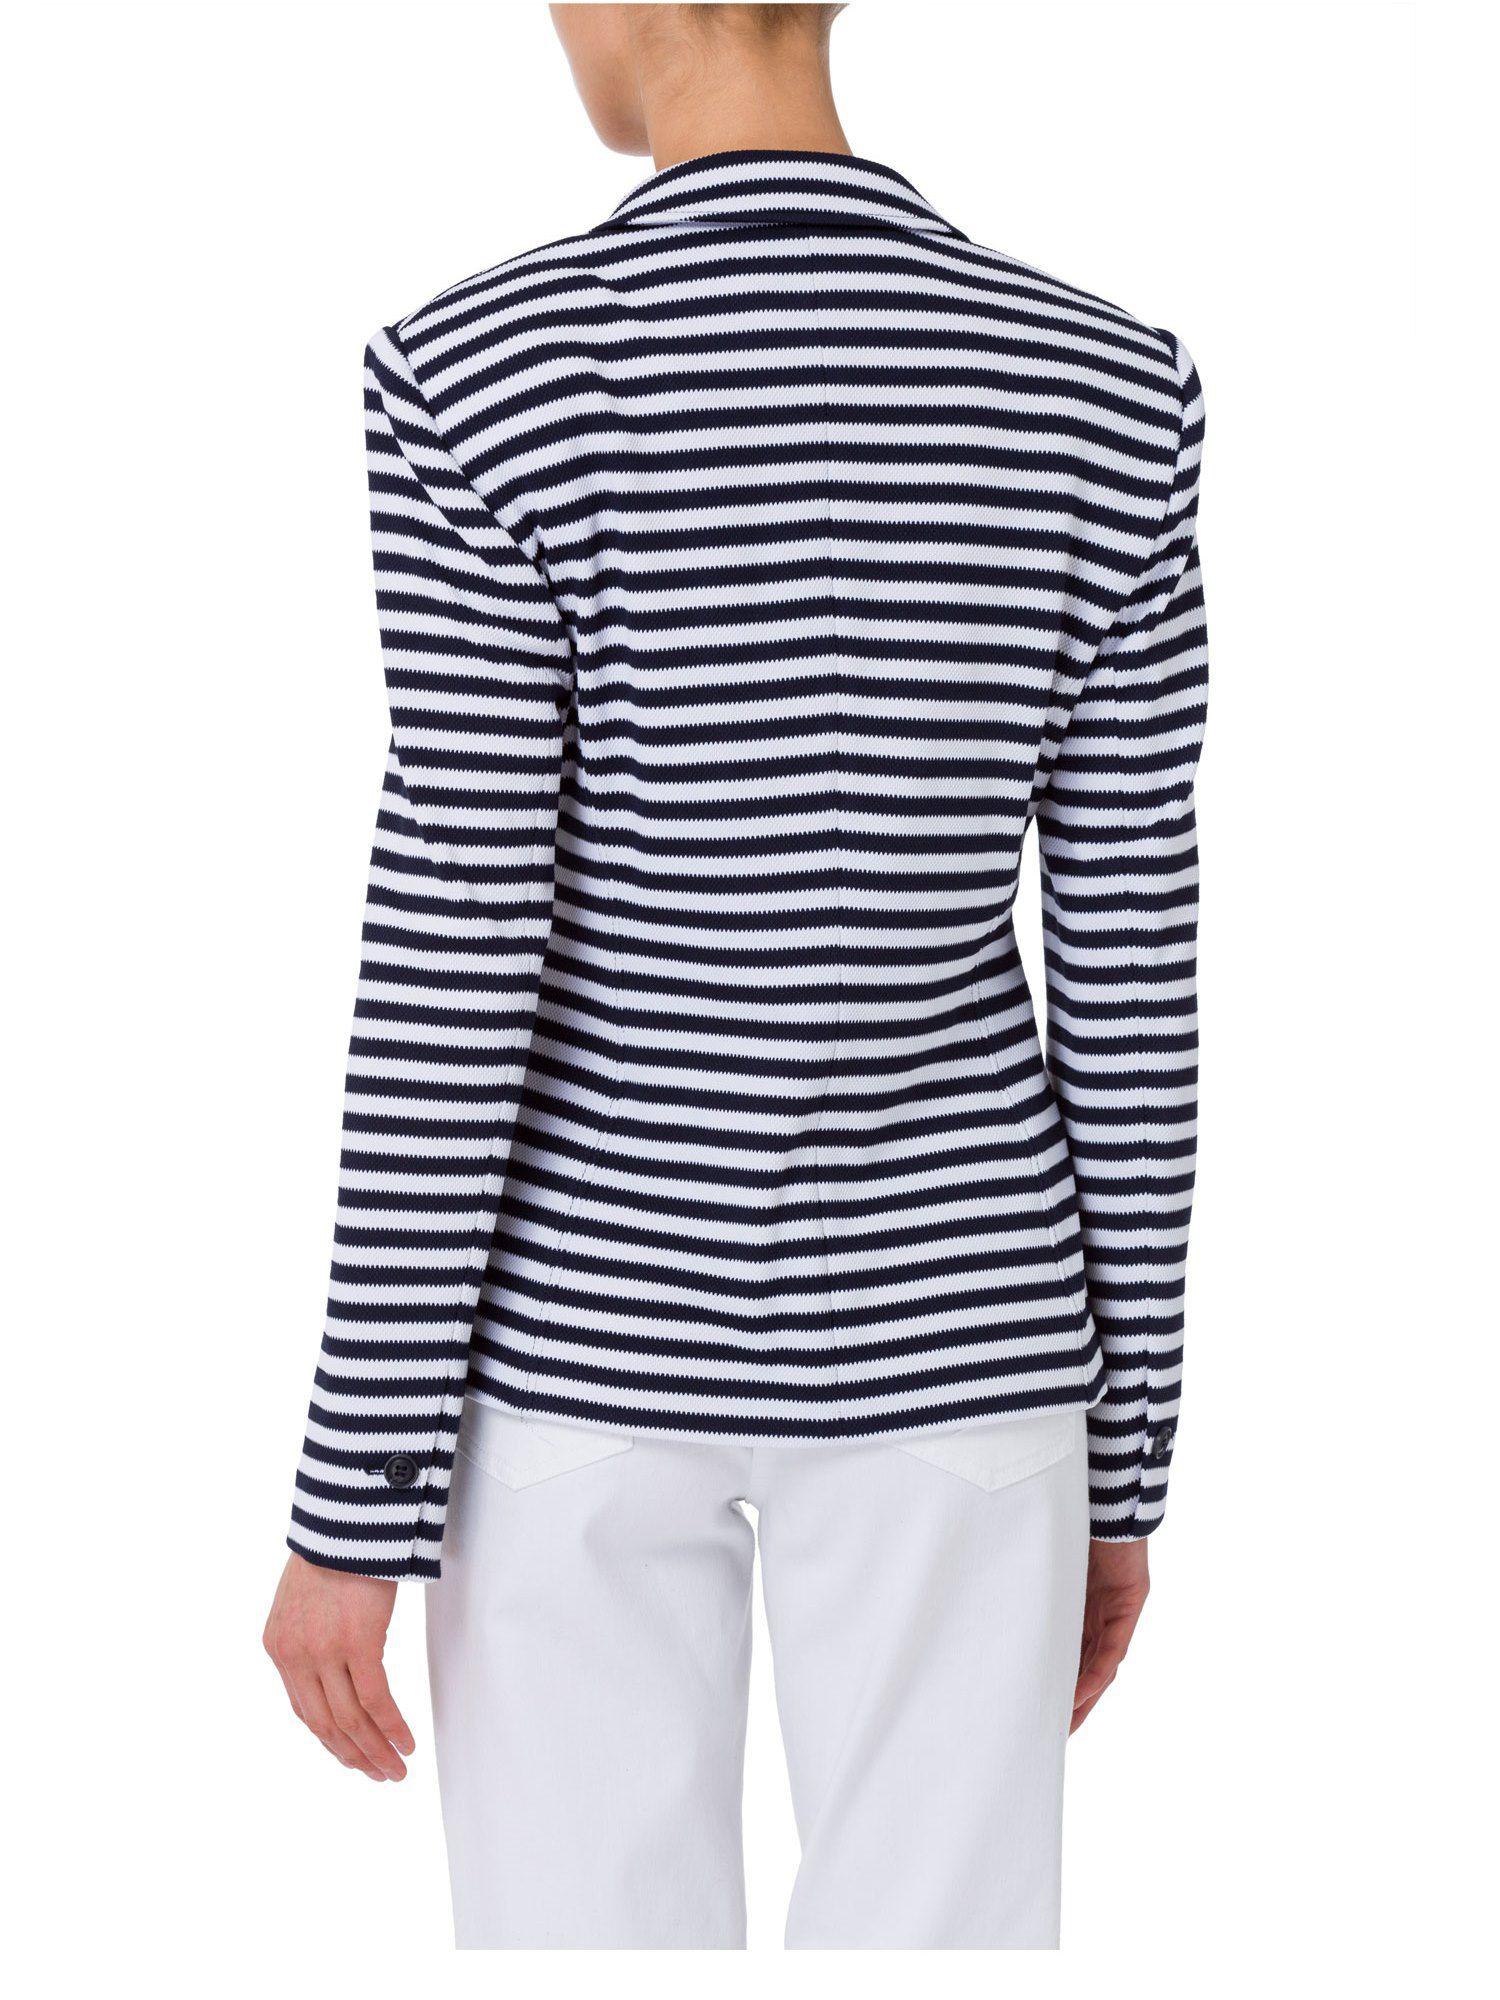 Black and white stripe blazer Save. Was £ Then £ Now £ > Wallis Petite black blazer jacket Save. Was £ Now £ Wallis Tall navy pinstriped jacket Save. Was £ Now £ Evans Khaki ribbed blazer Save. Was £ Now £ J by Jasper Conran Tan double breasted jacket.